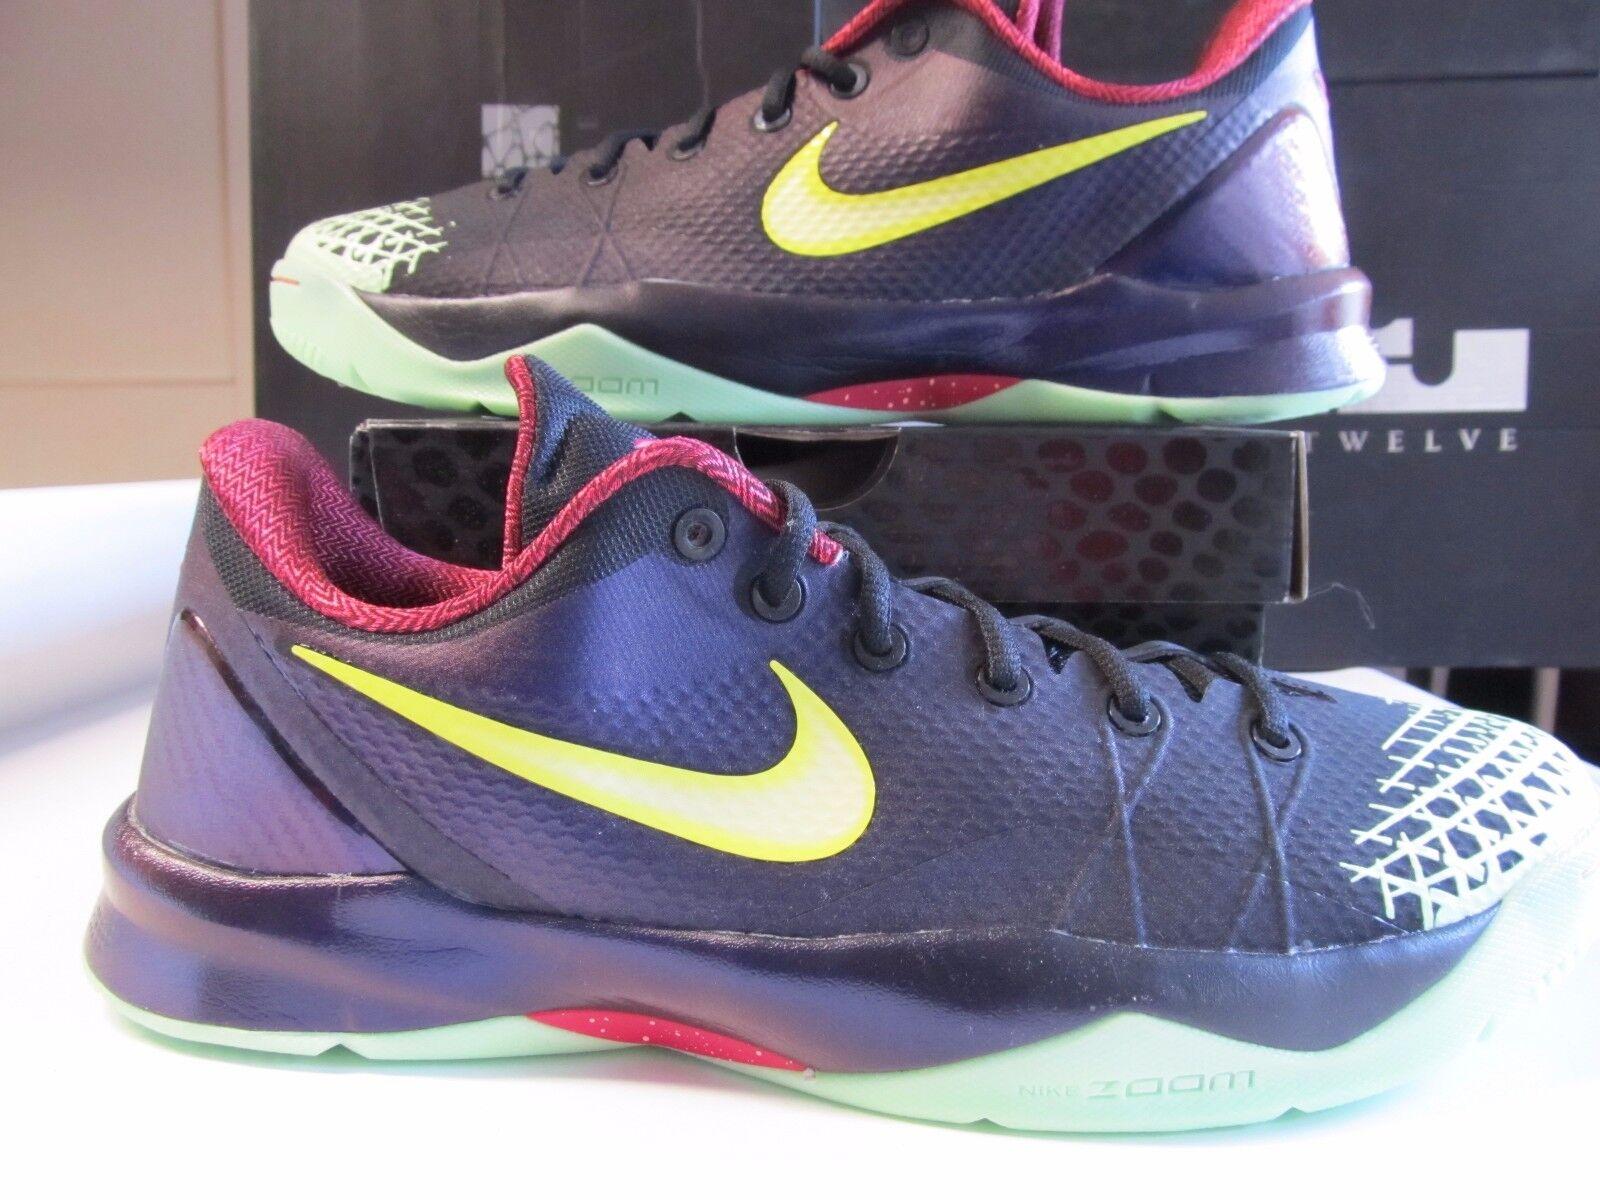 Nike Zoom Kobe Venomenon 4 Black Lemon Chiffon Purple GLOW IN DARK 13 635578 003